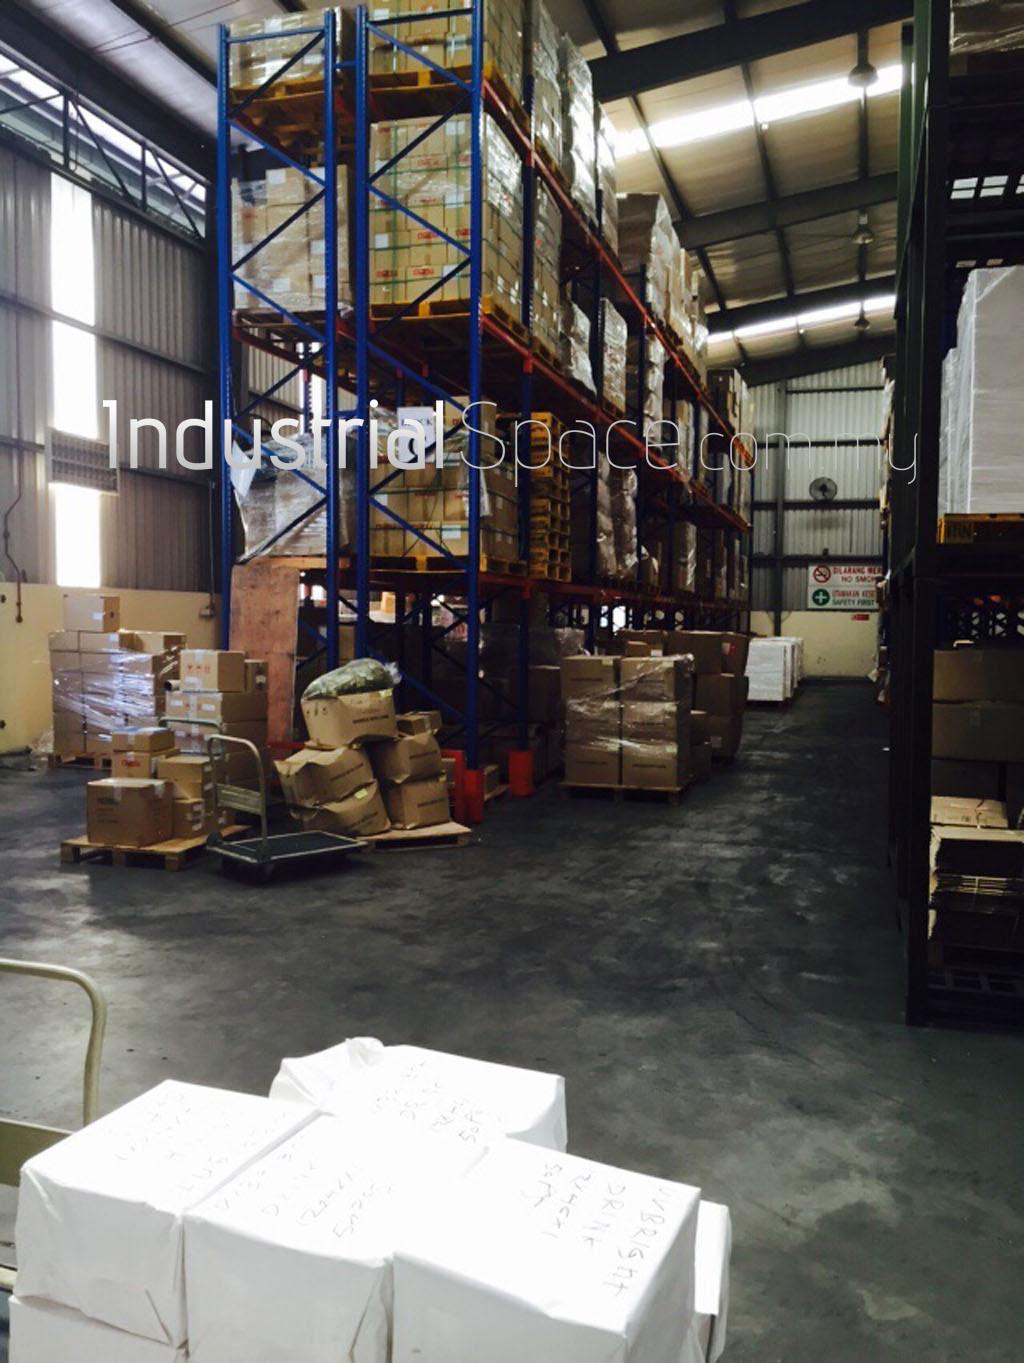 IMG-20150518-WA0003 copy